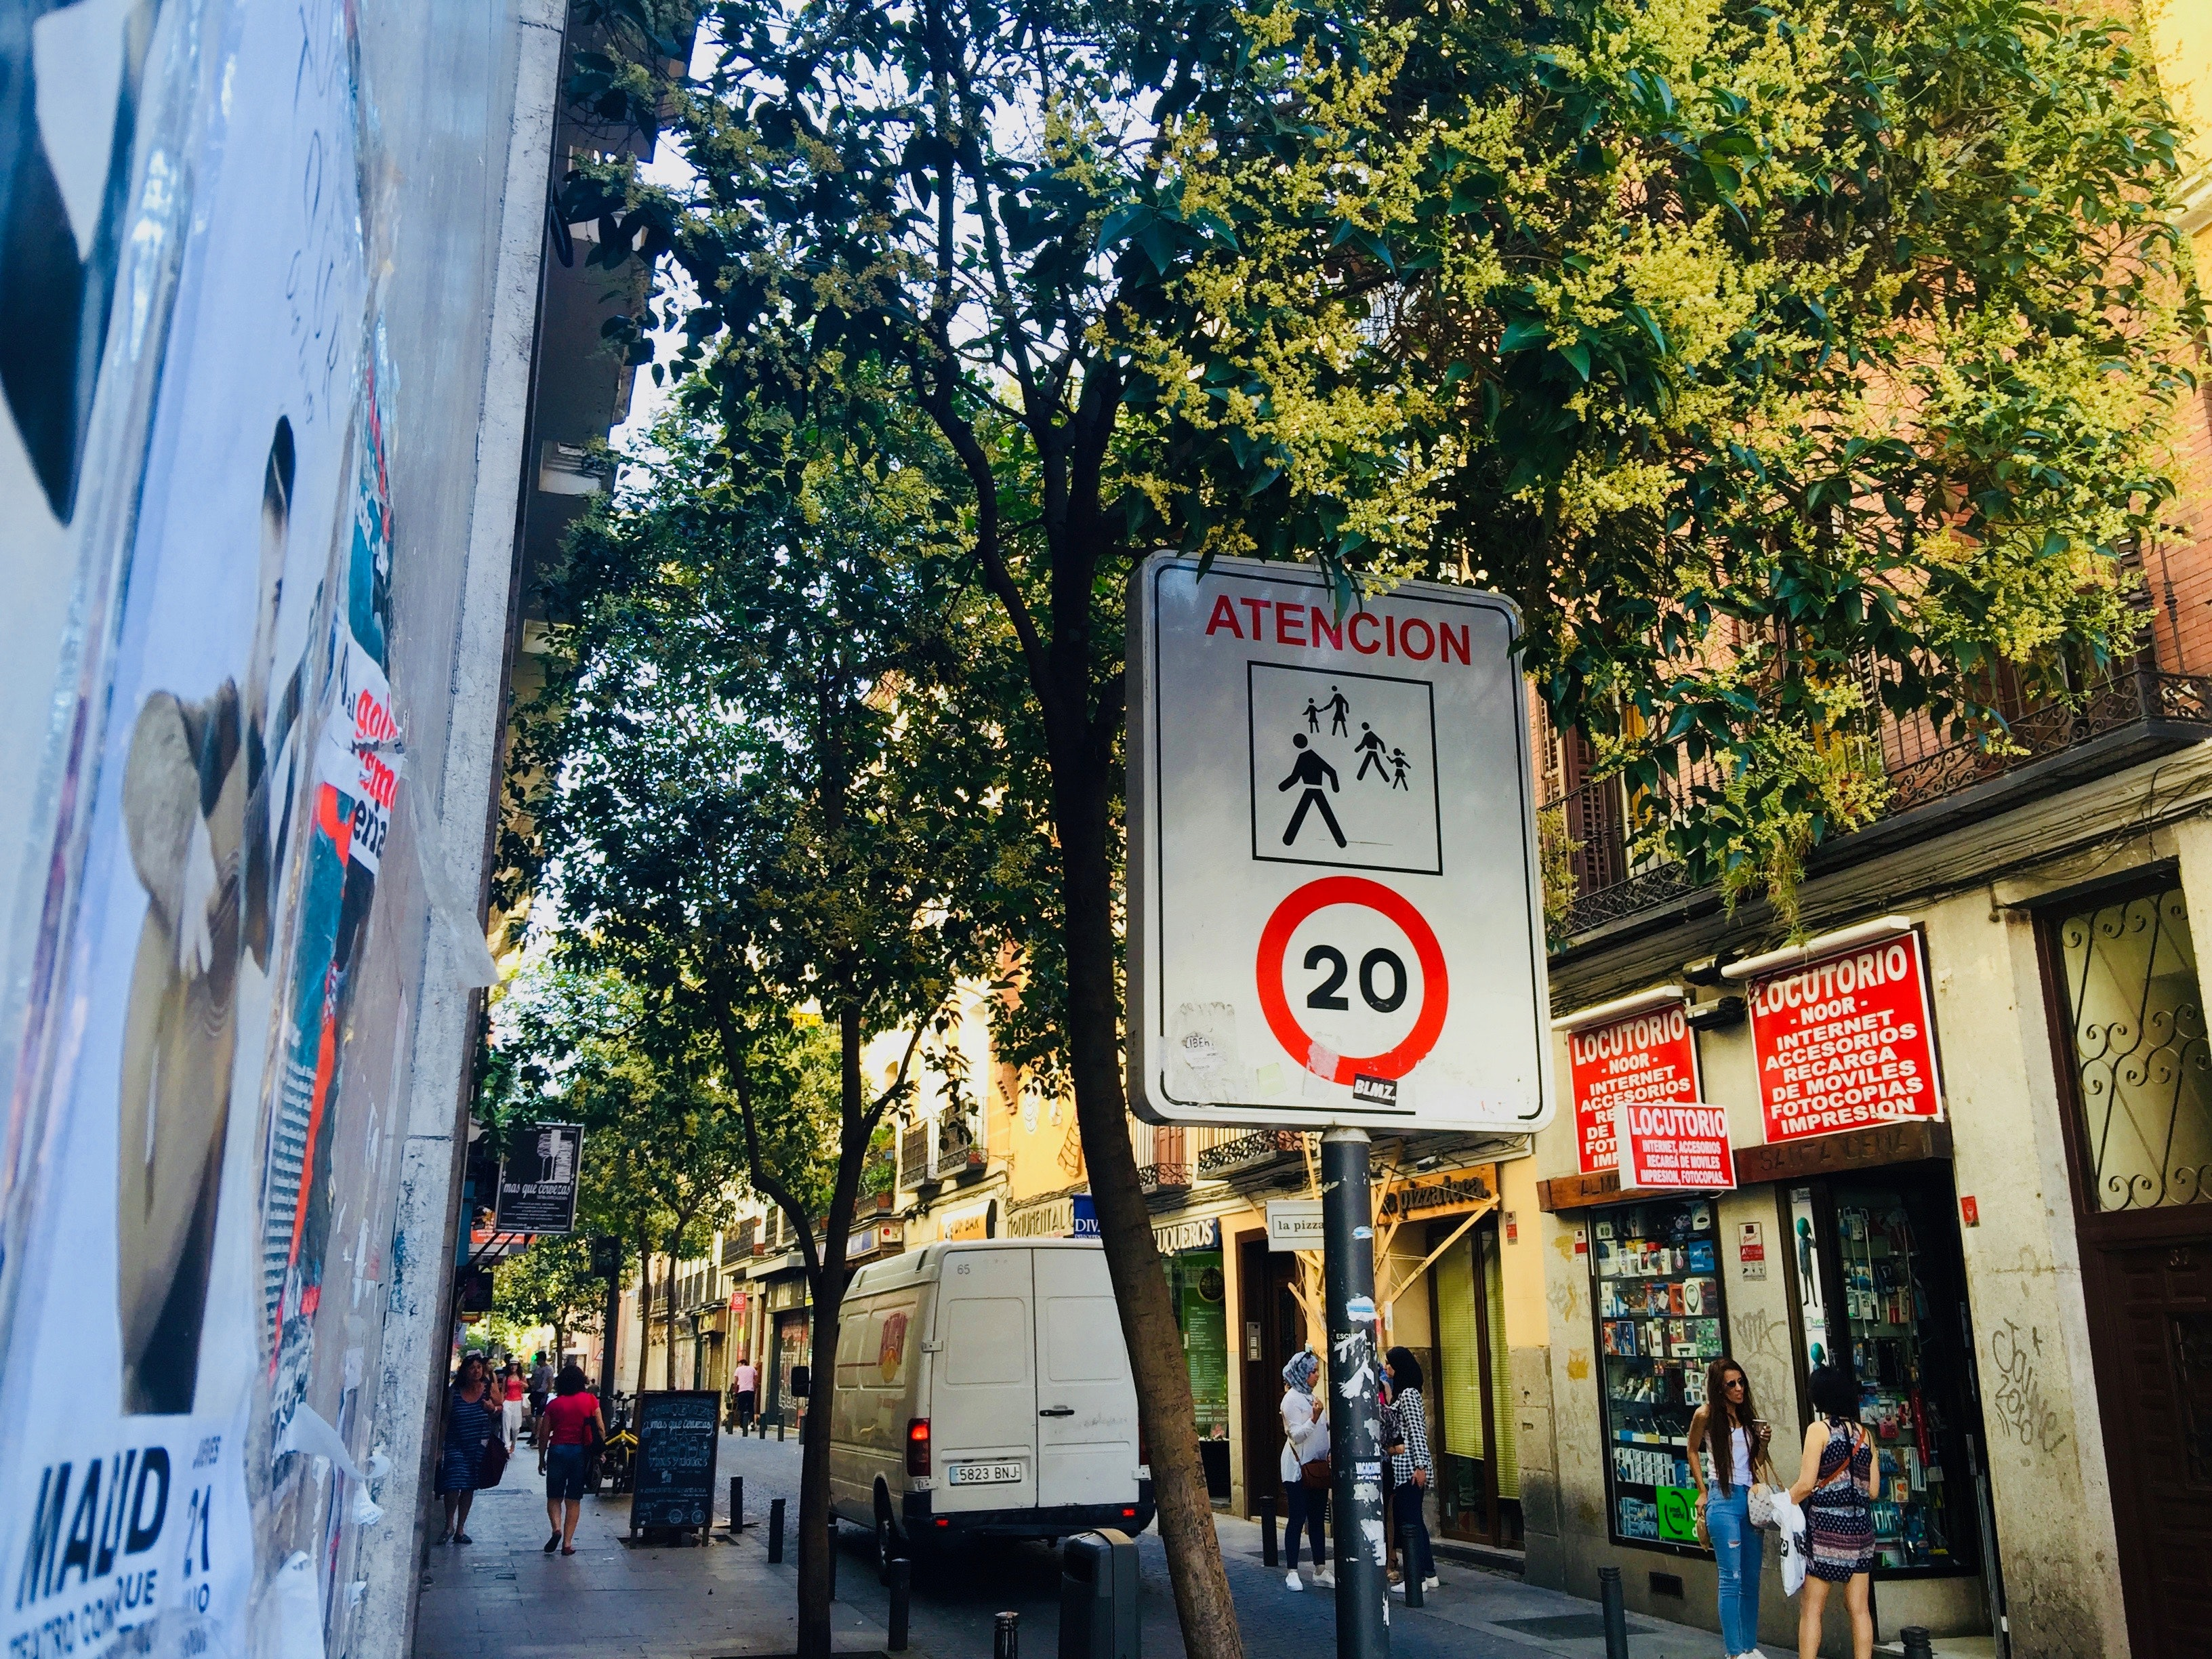 Atencion 20 Road Sign, Alley, Public, Urban, Transportation system, HQ Photo